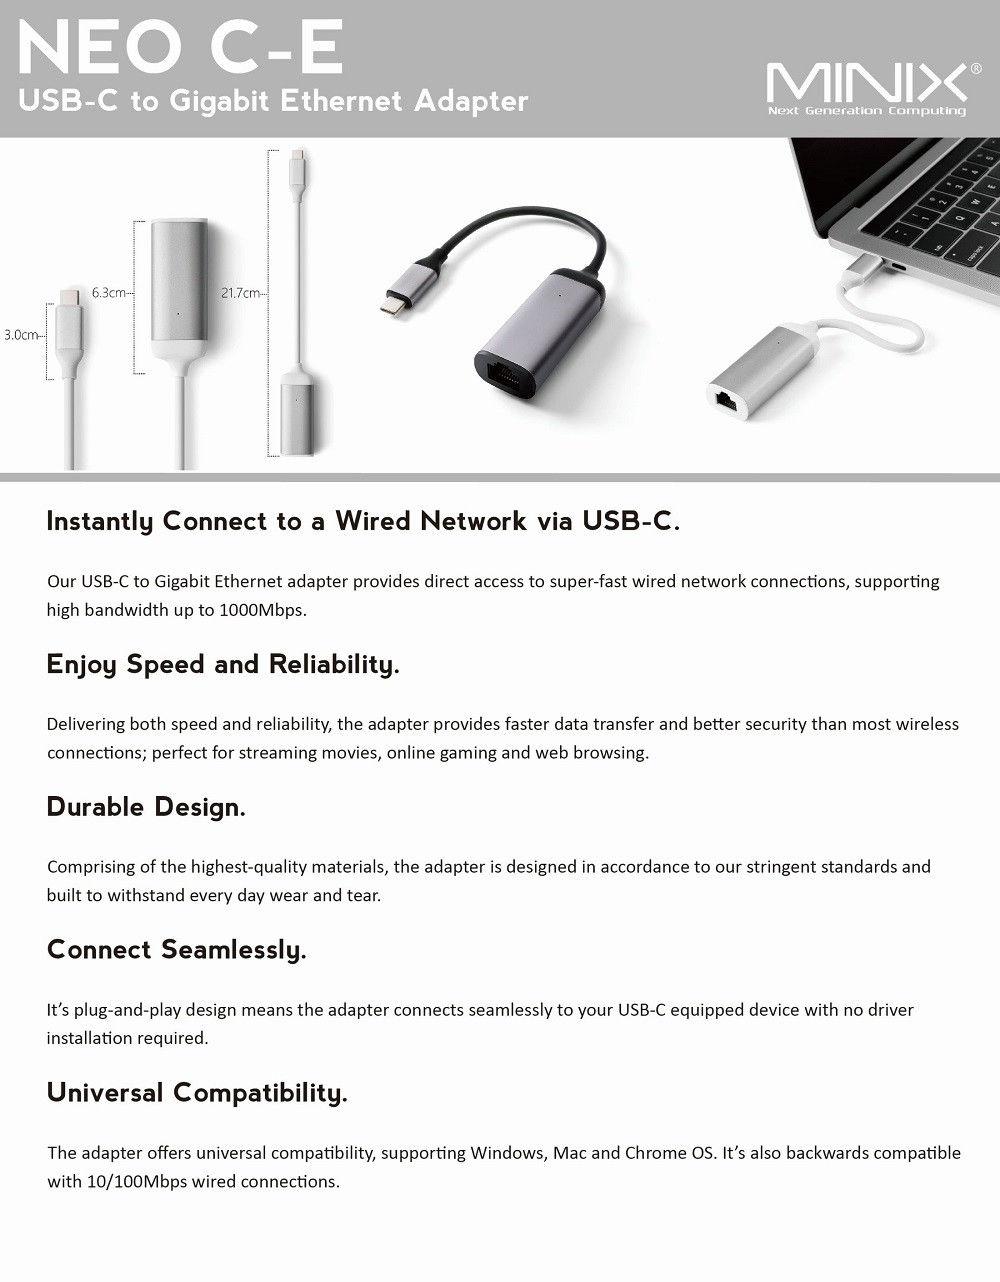 MINIX NEO C - E Advanced High Speed USB-C to Gigabit Ethernet Adapter